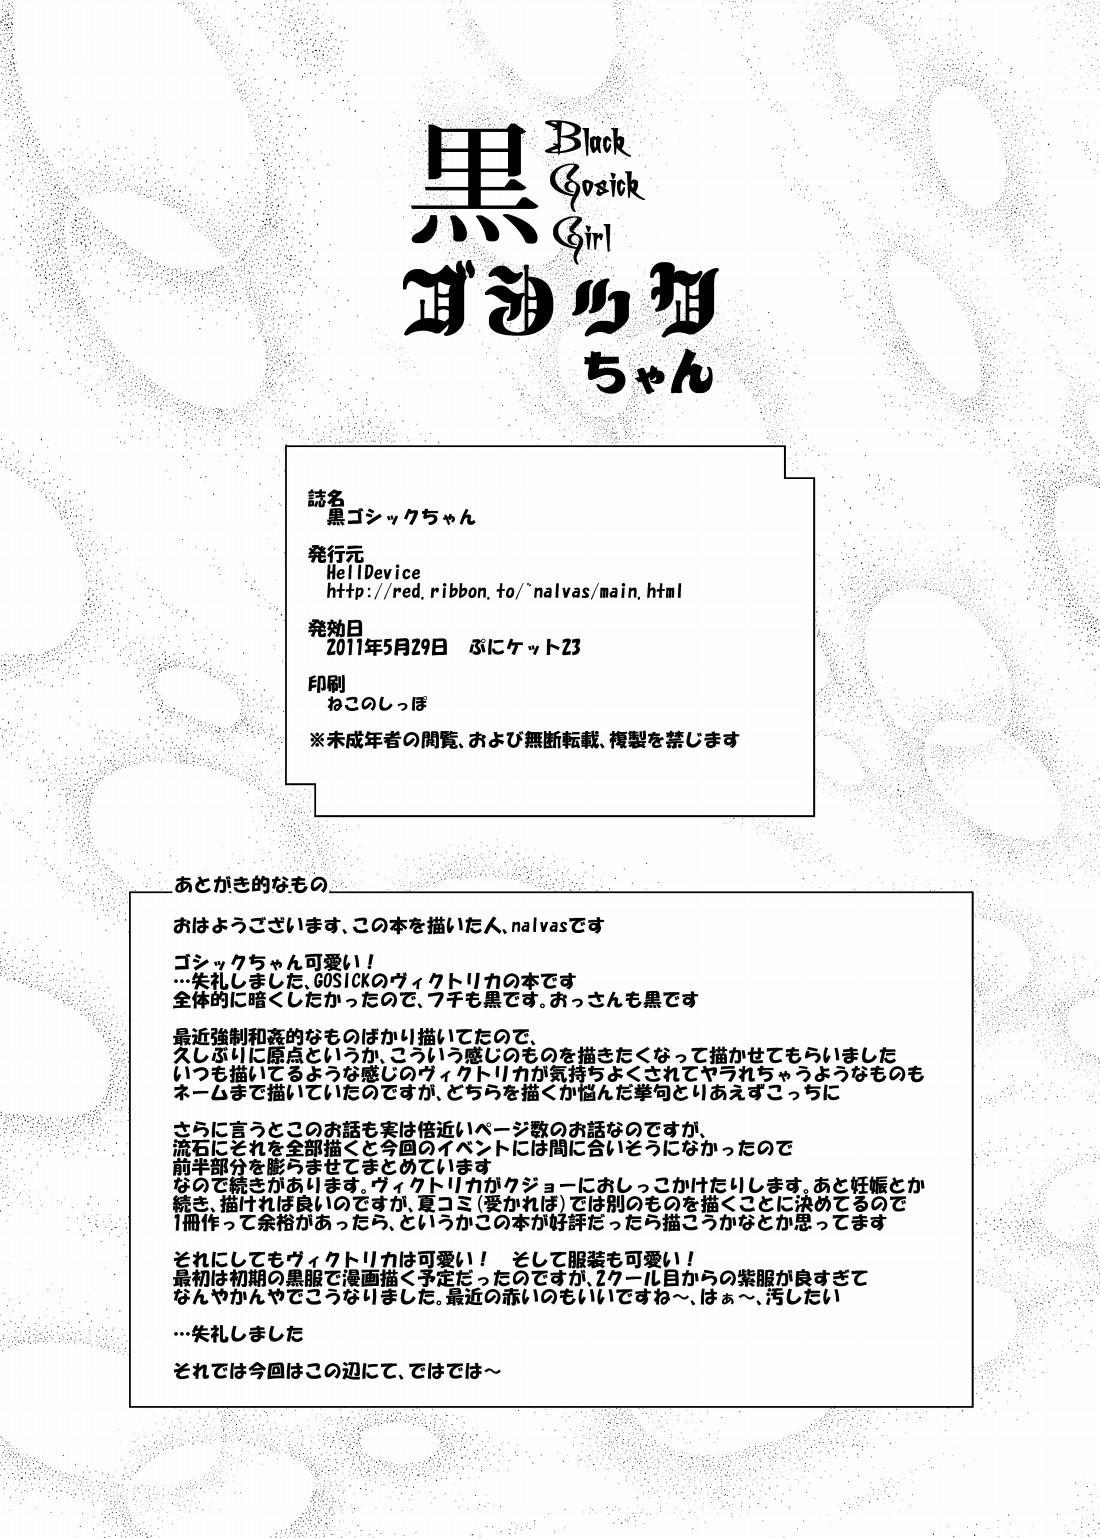 [HellDevice (nalvas)] Kuro Gosick-chan - Black Gosick Girl (GOSICK) [Digital] 20